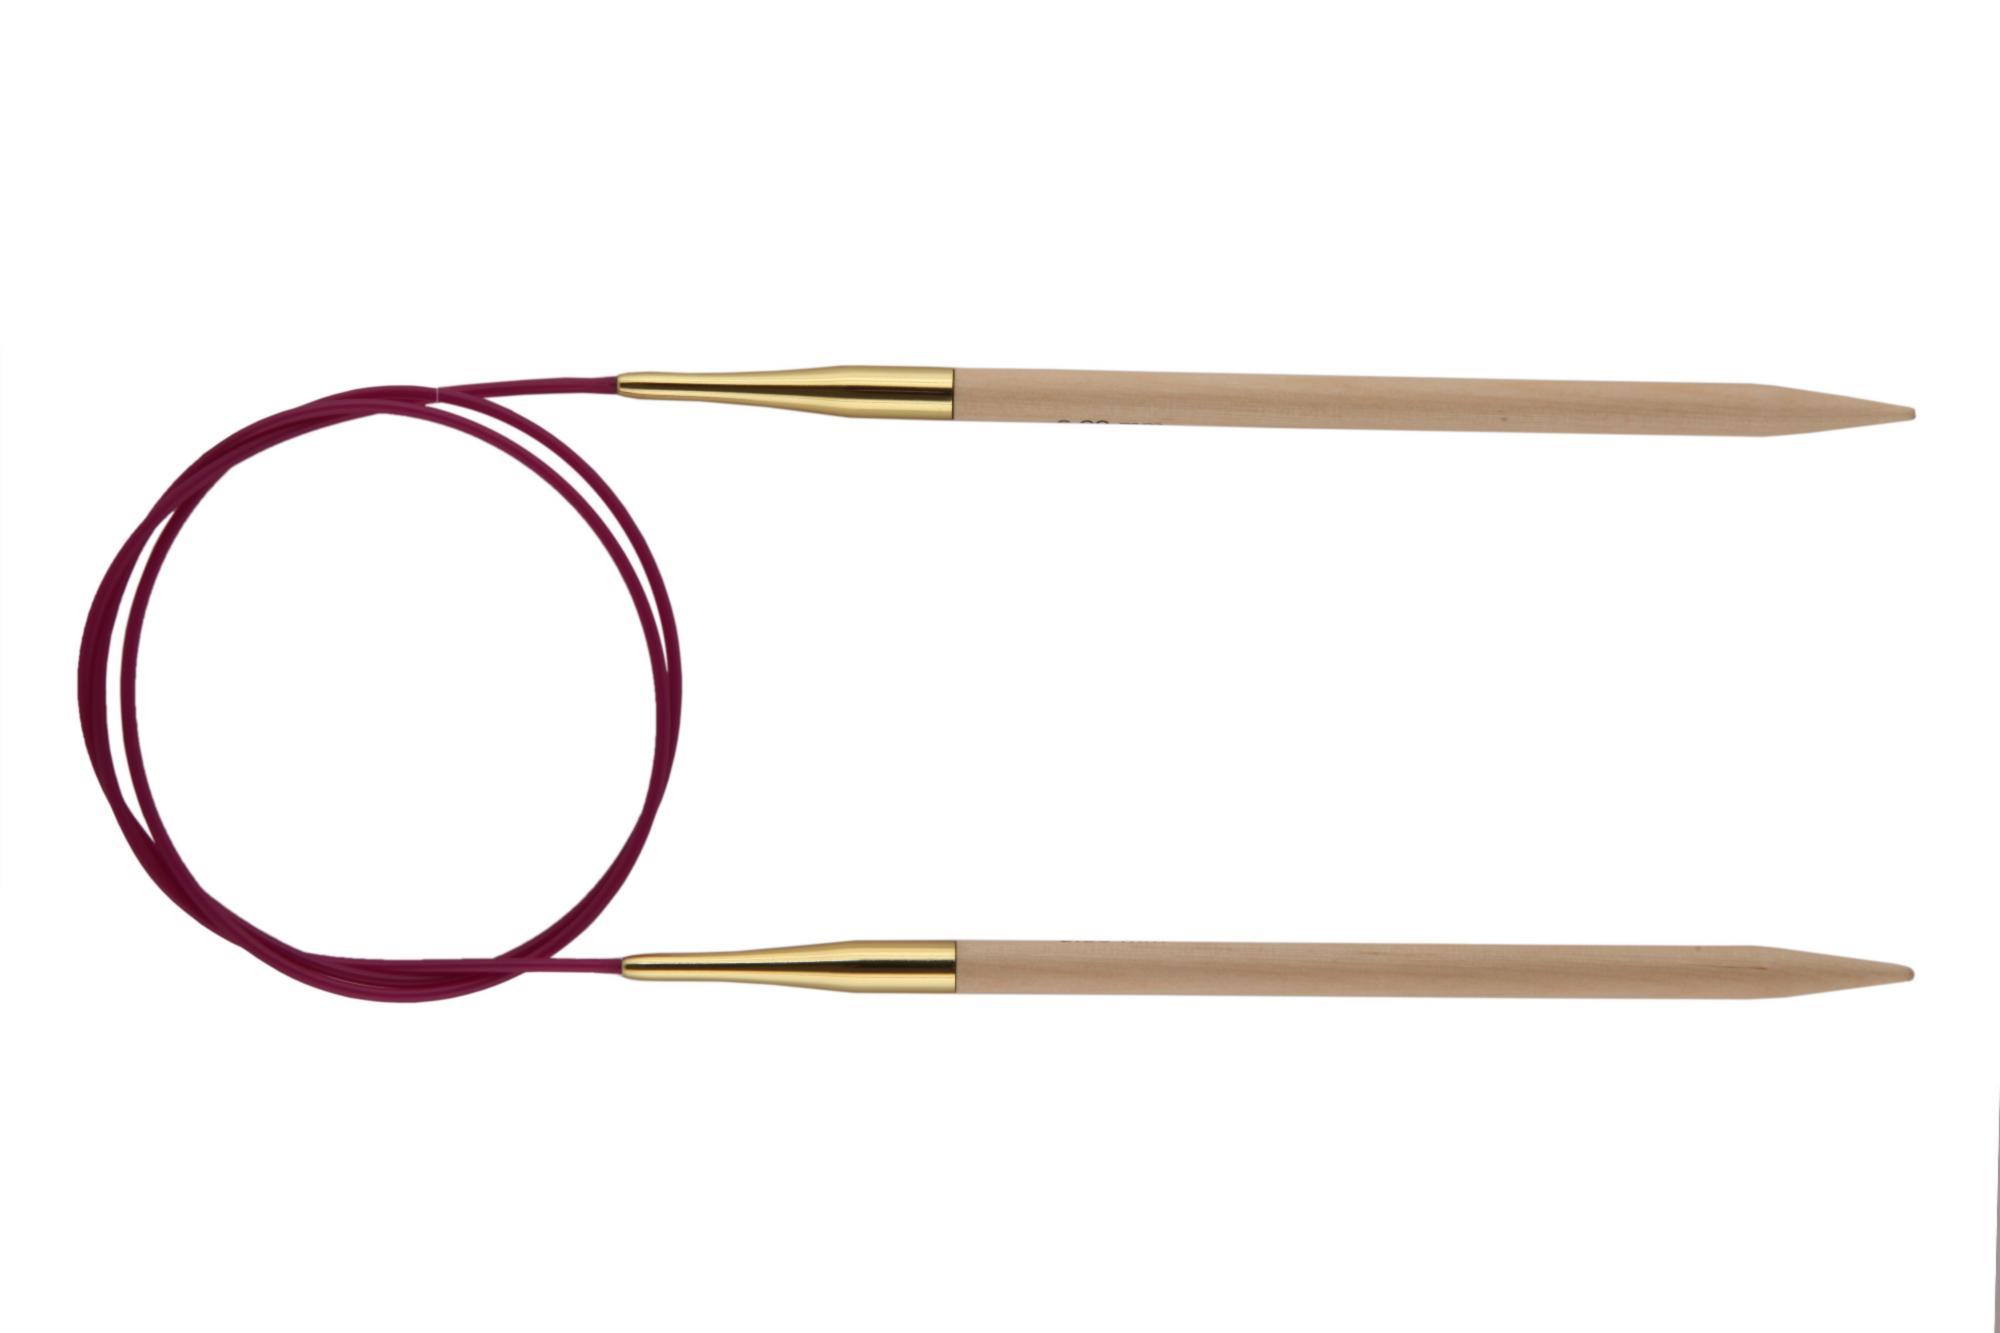 Спицы круговые 100 см Basix Birch Wood KnitPro, 35344, 7.00 мм